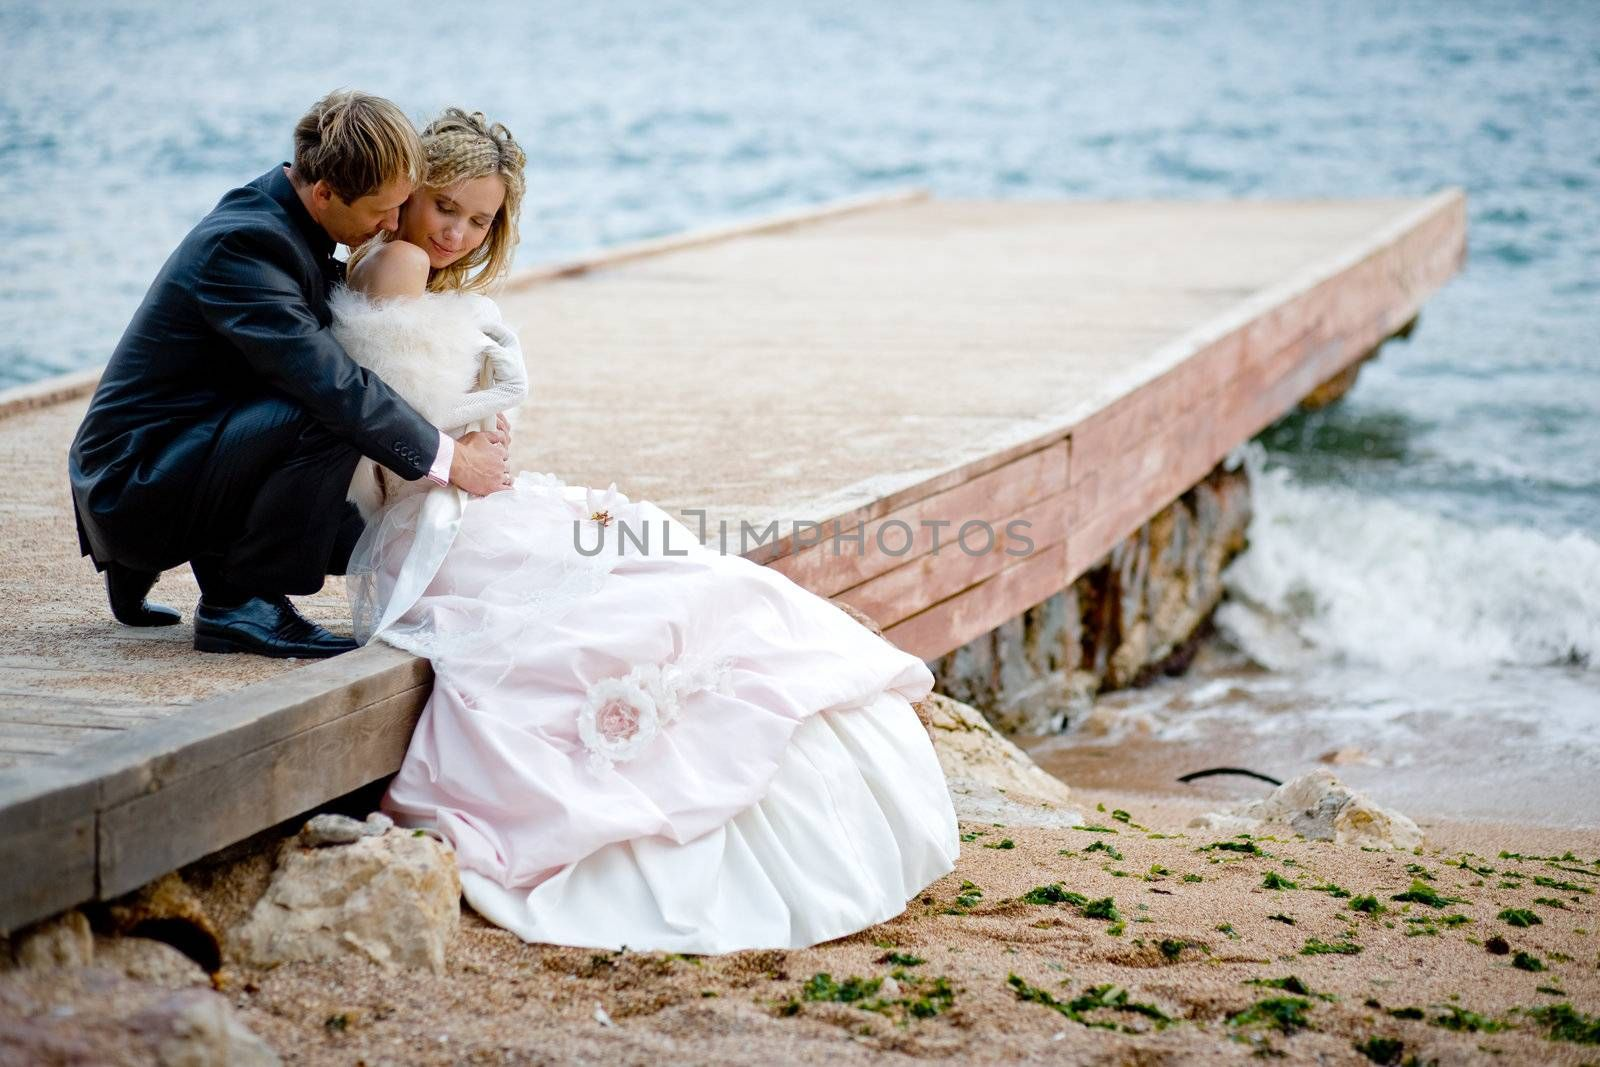 Romantic wedding couple at beach